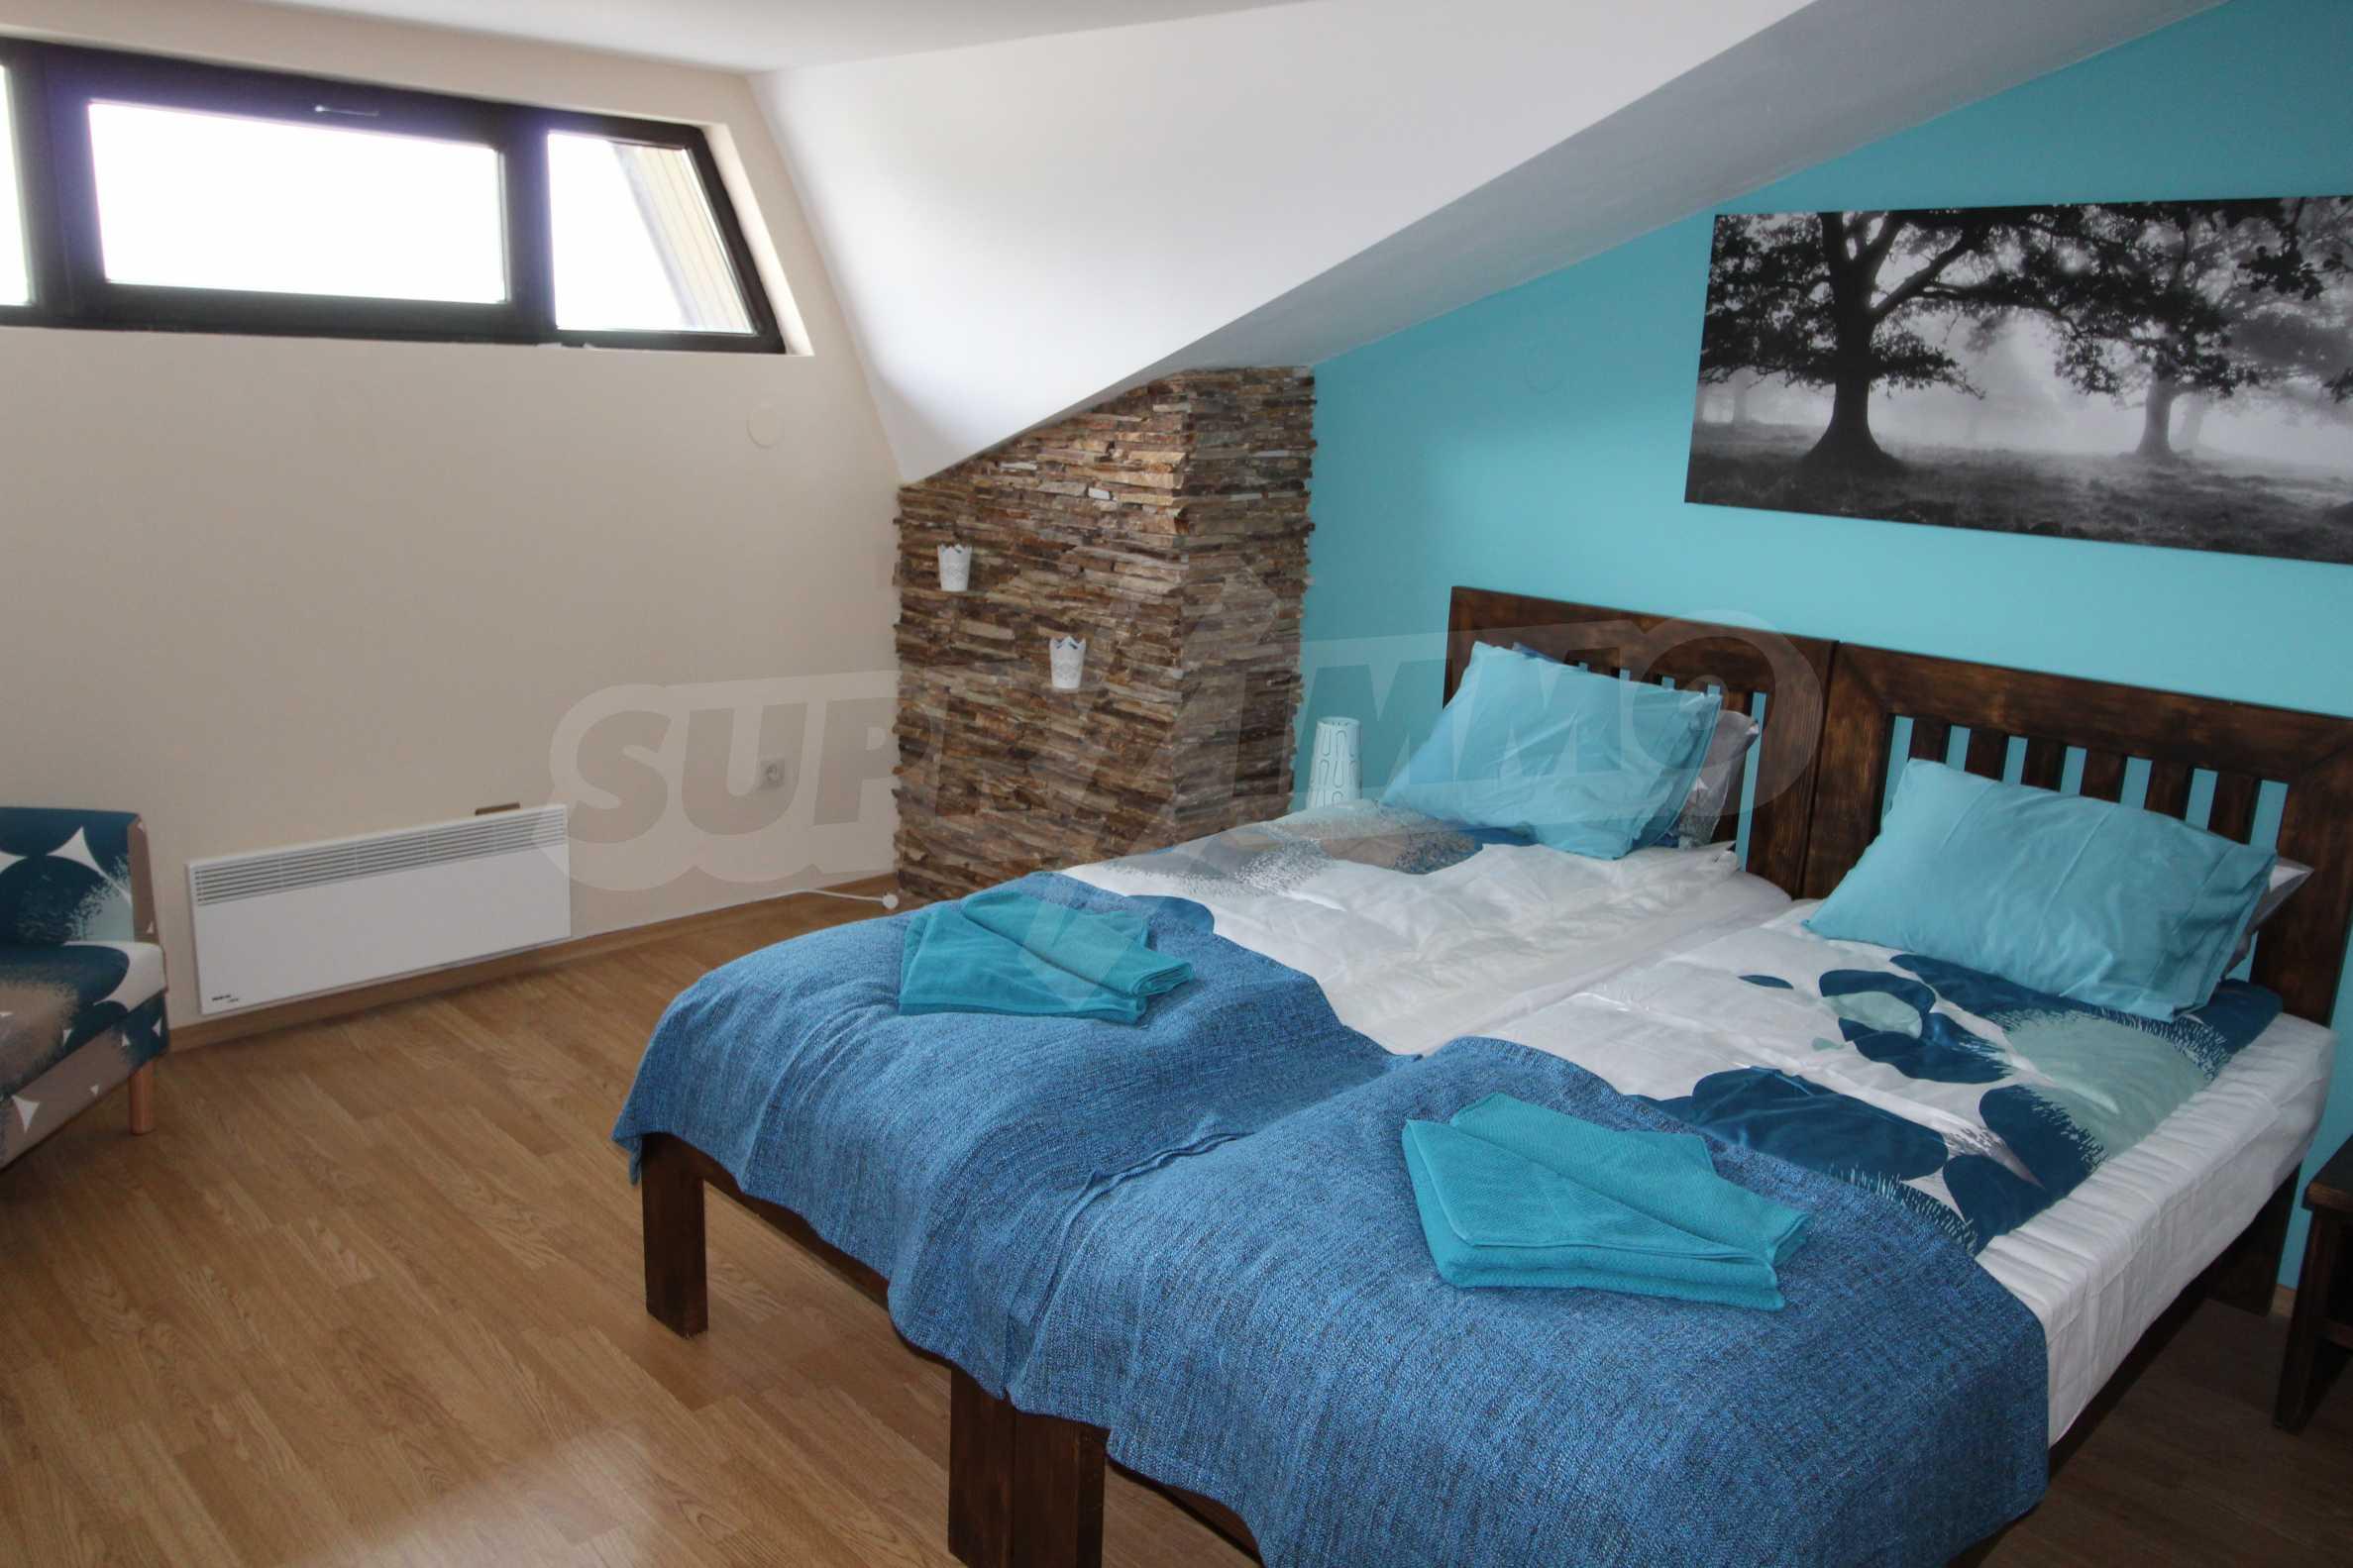 Стилен апартамент в близост до ски курорта Банско 14